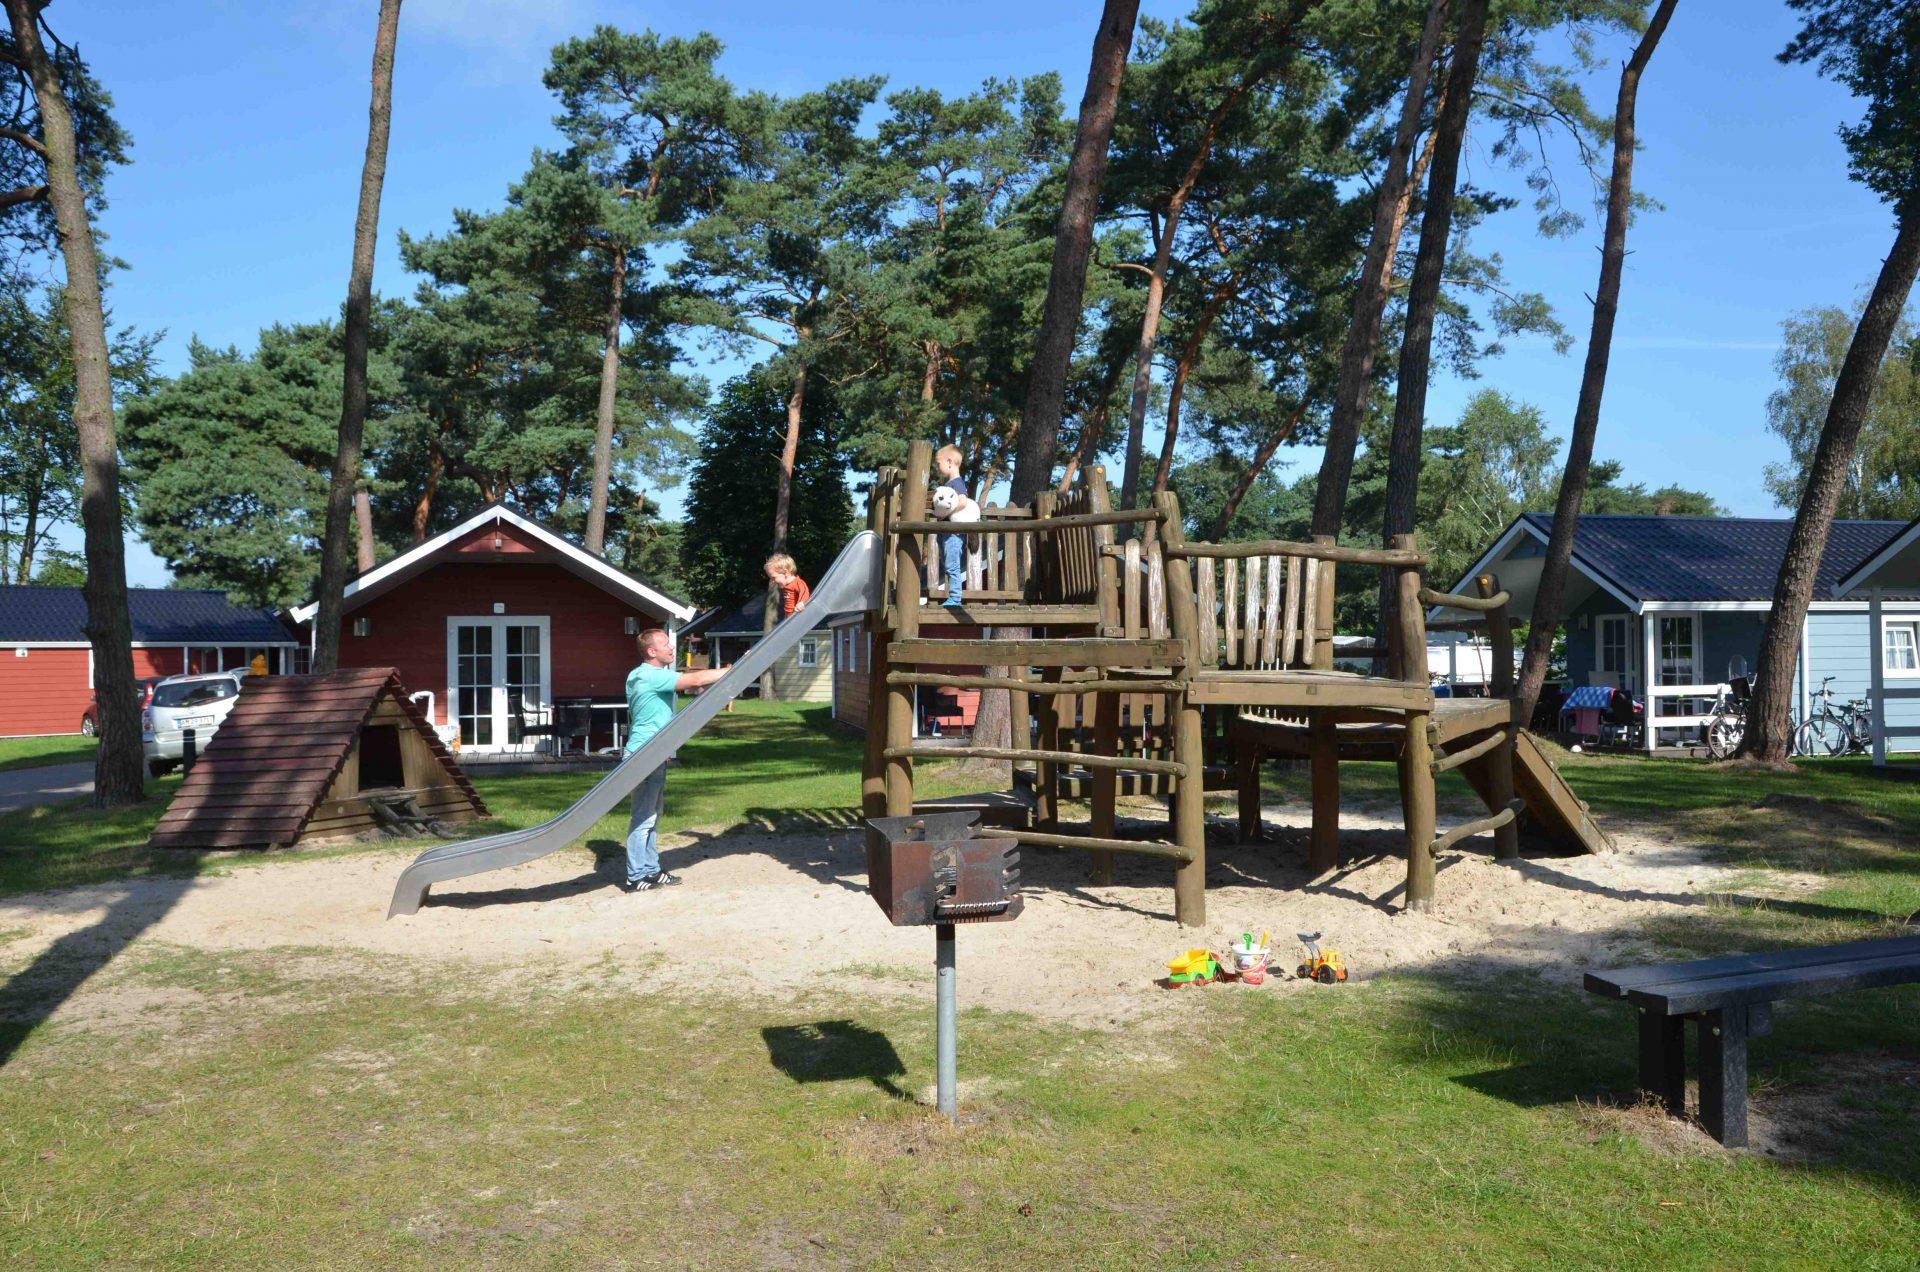 lodges 4 personen holland campings. Black Bedroom Furniture Sets. Home Design Ideas